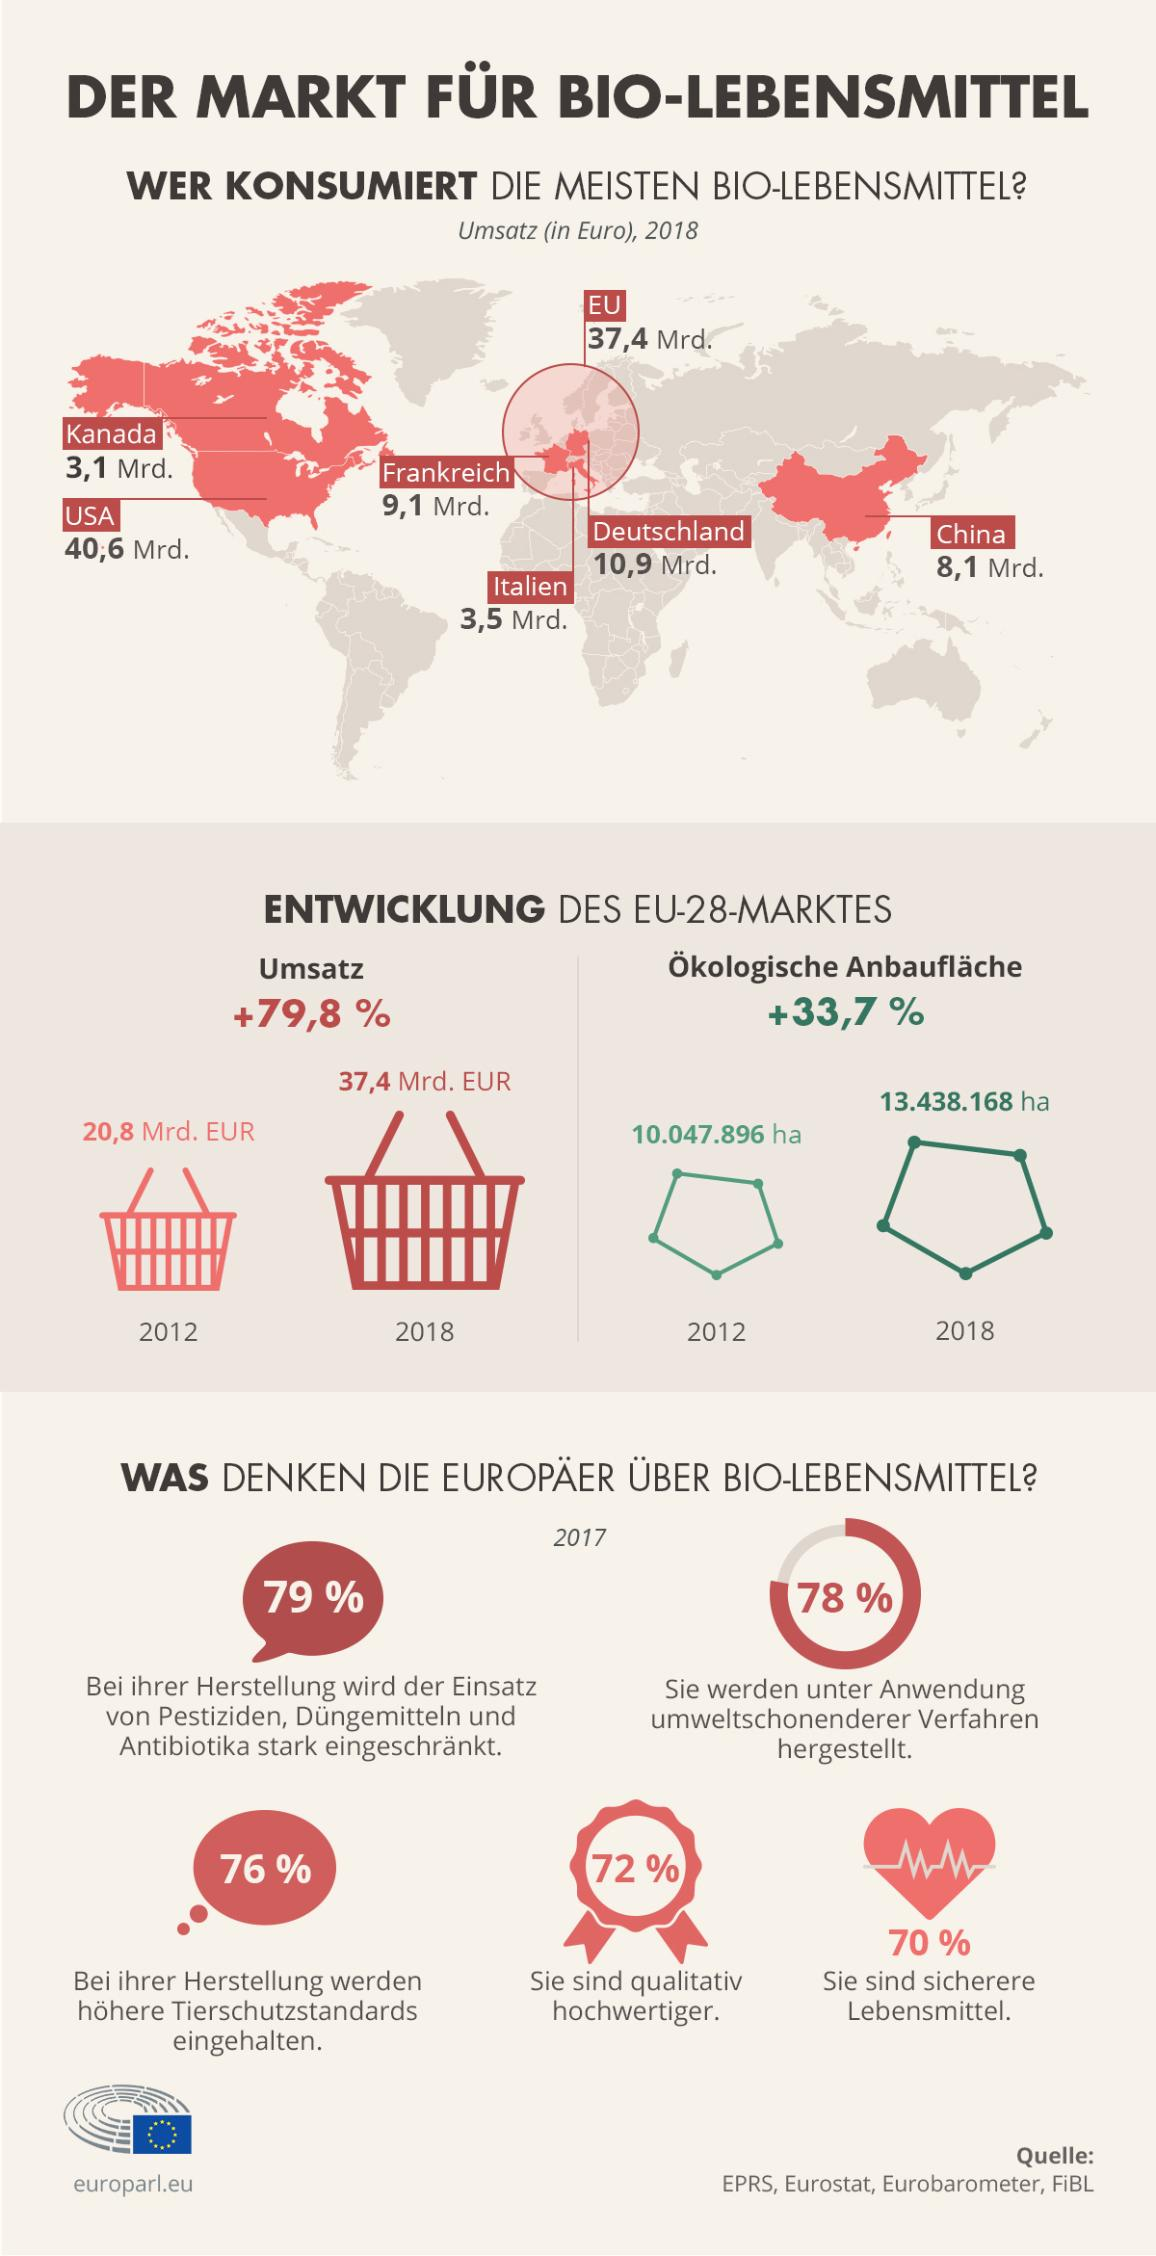 Infografik Entwicklung des EU-Marktes